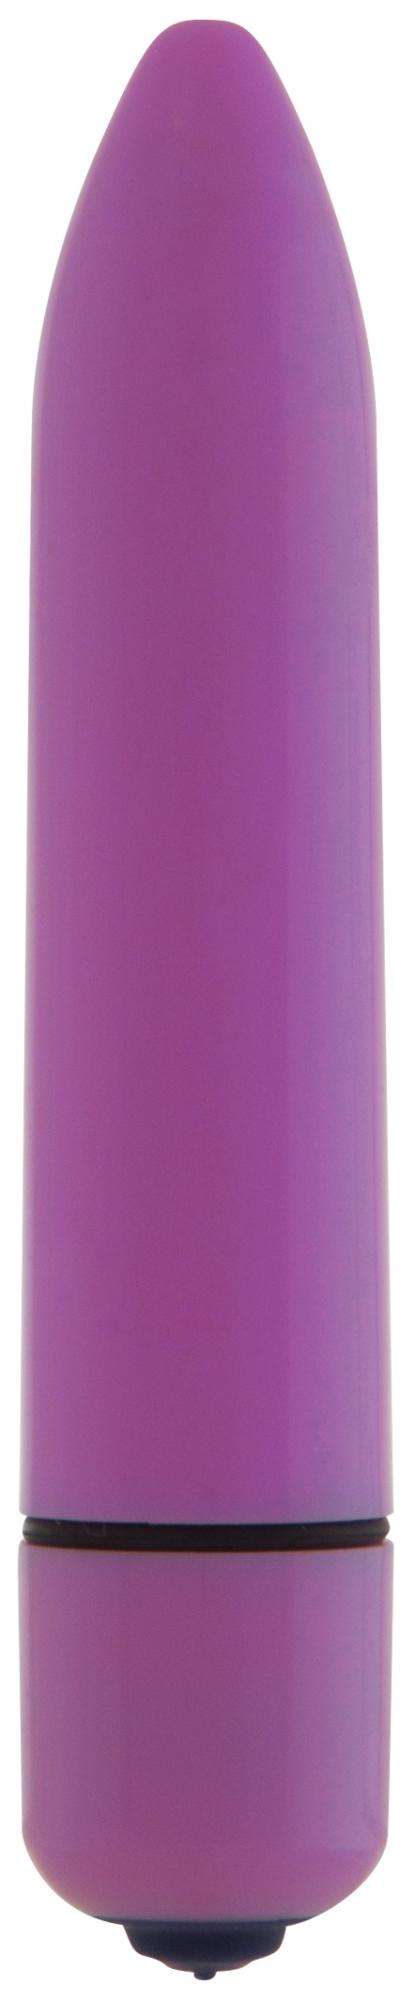 Thin Vibe - Purple